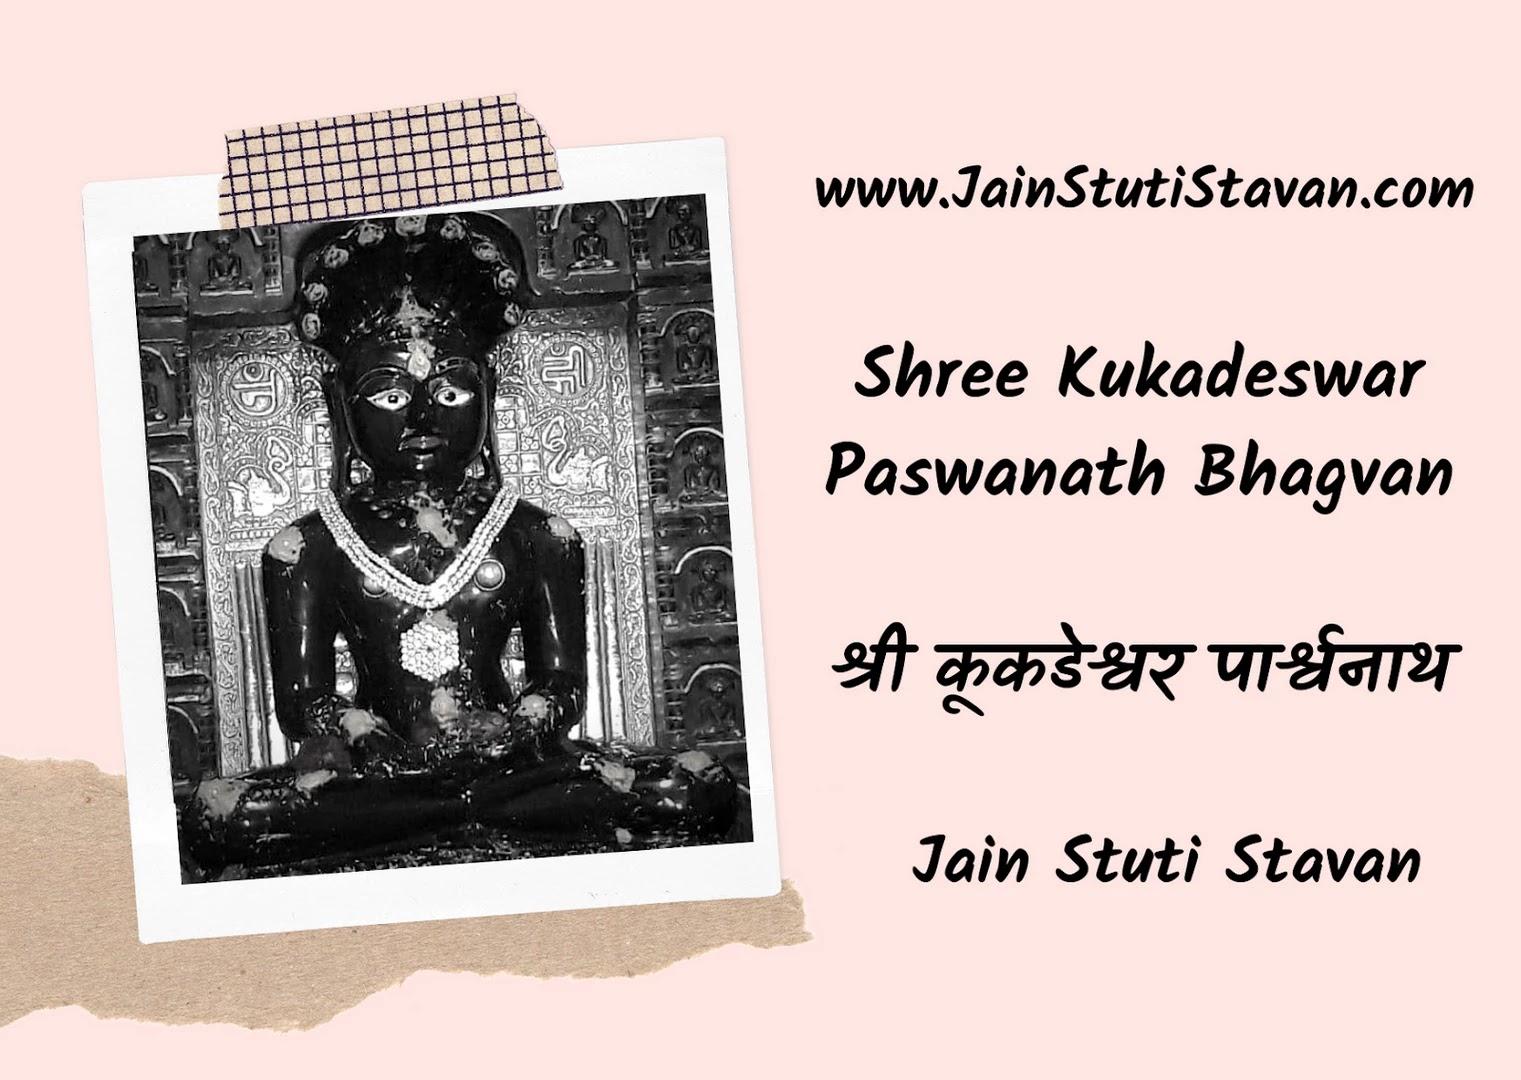 Shree Kukadeswar Paswanath Bhagvan